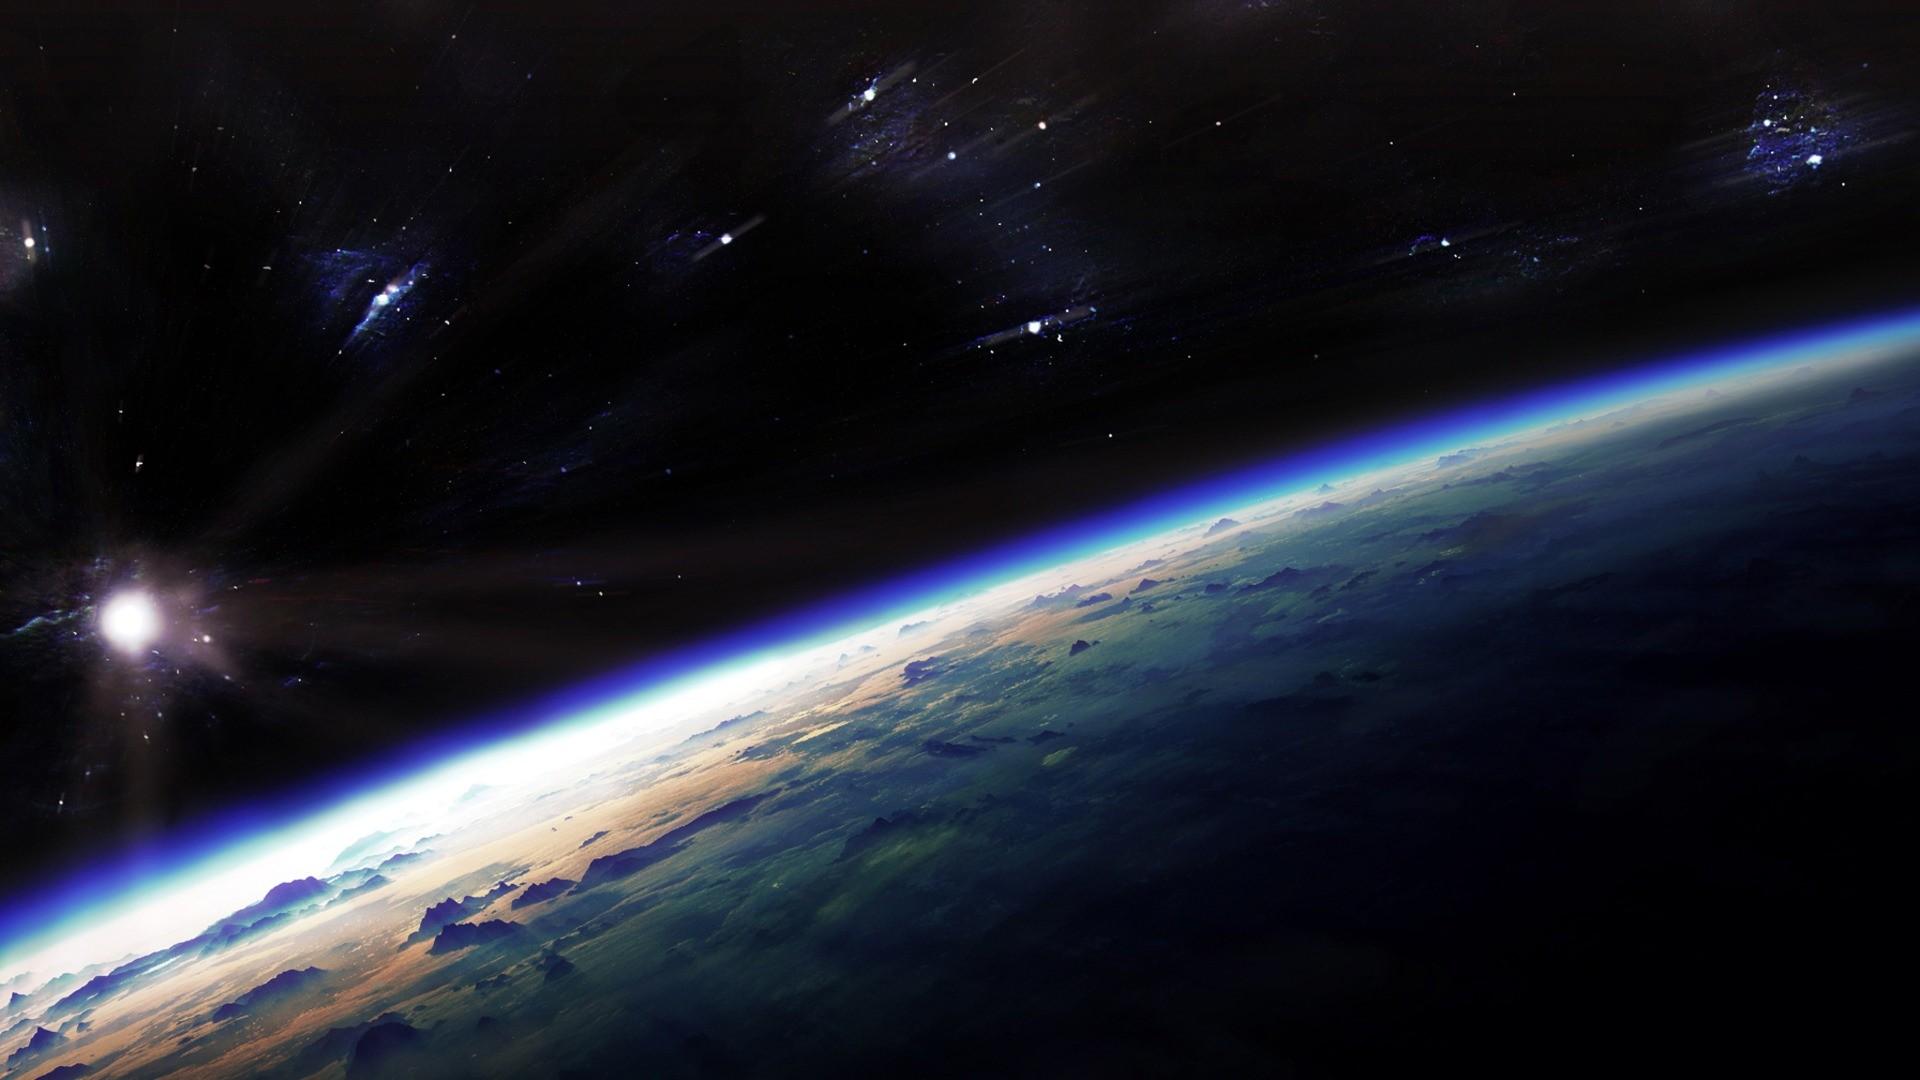 Dark Blue Space Wallpaper HD jpg 298716